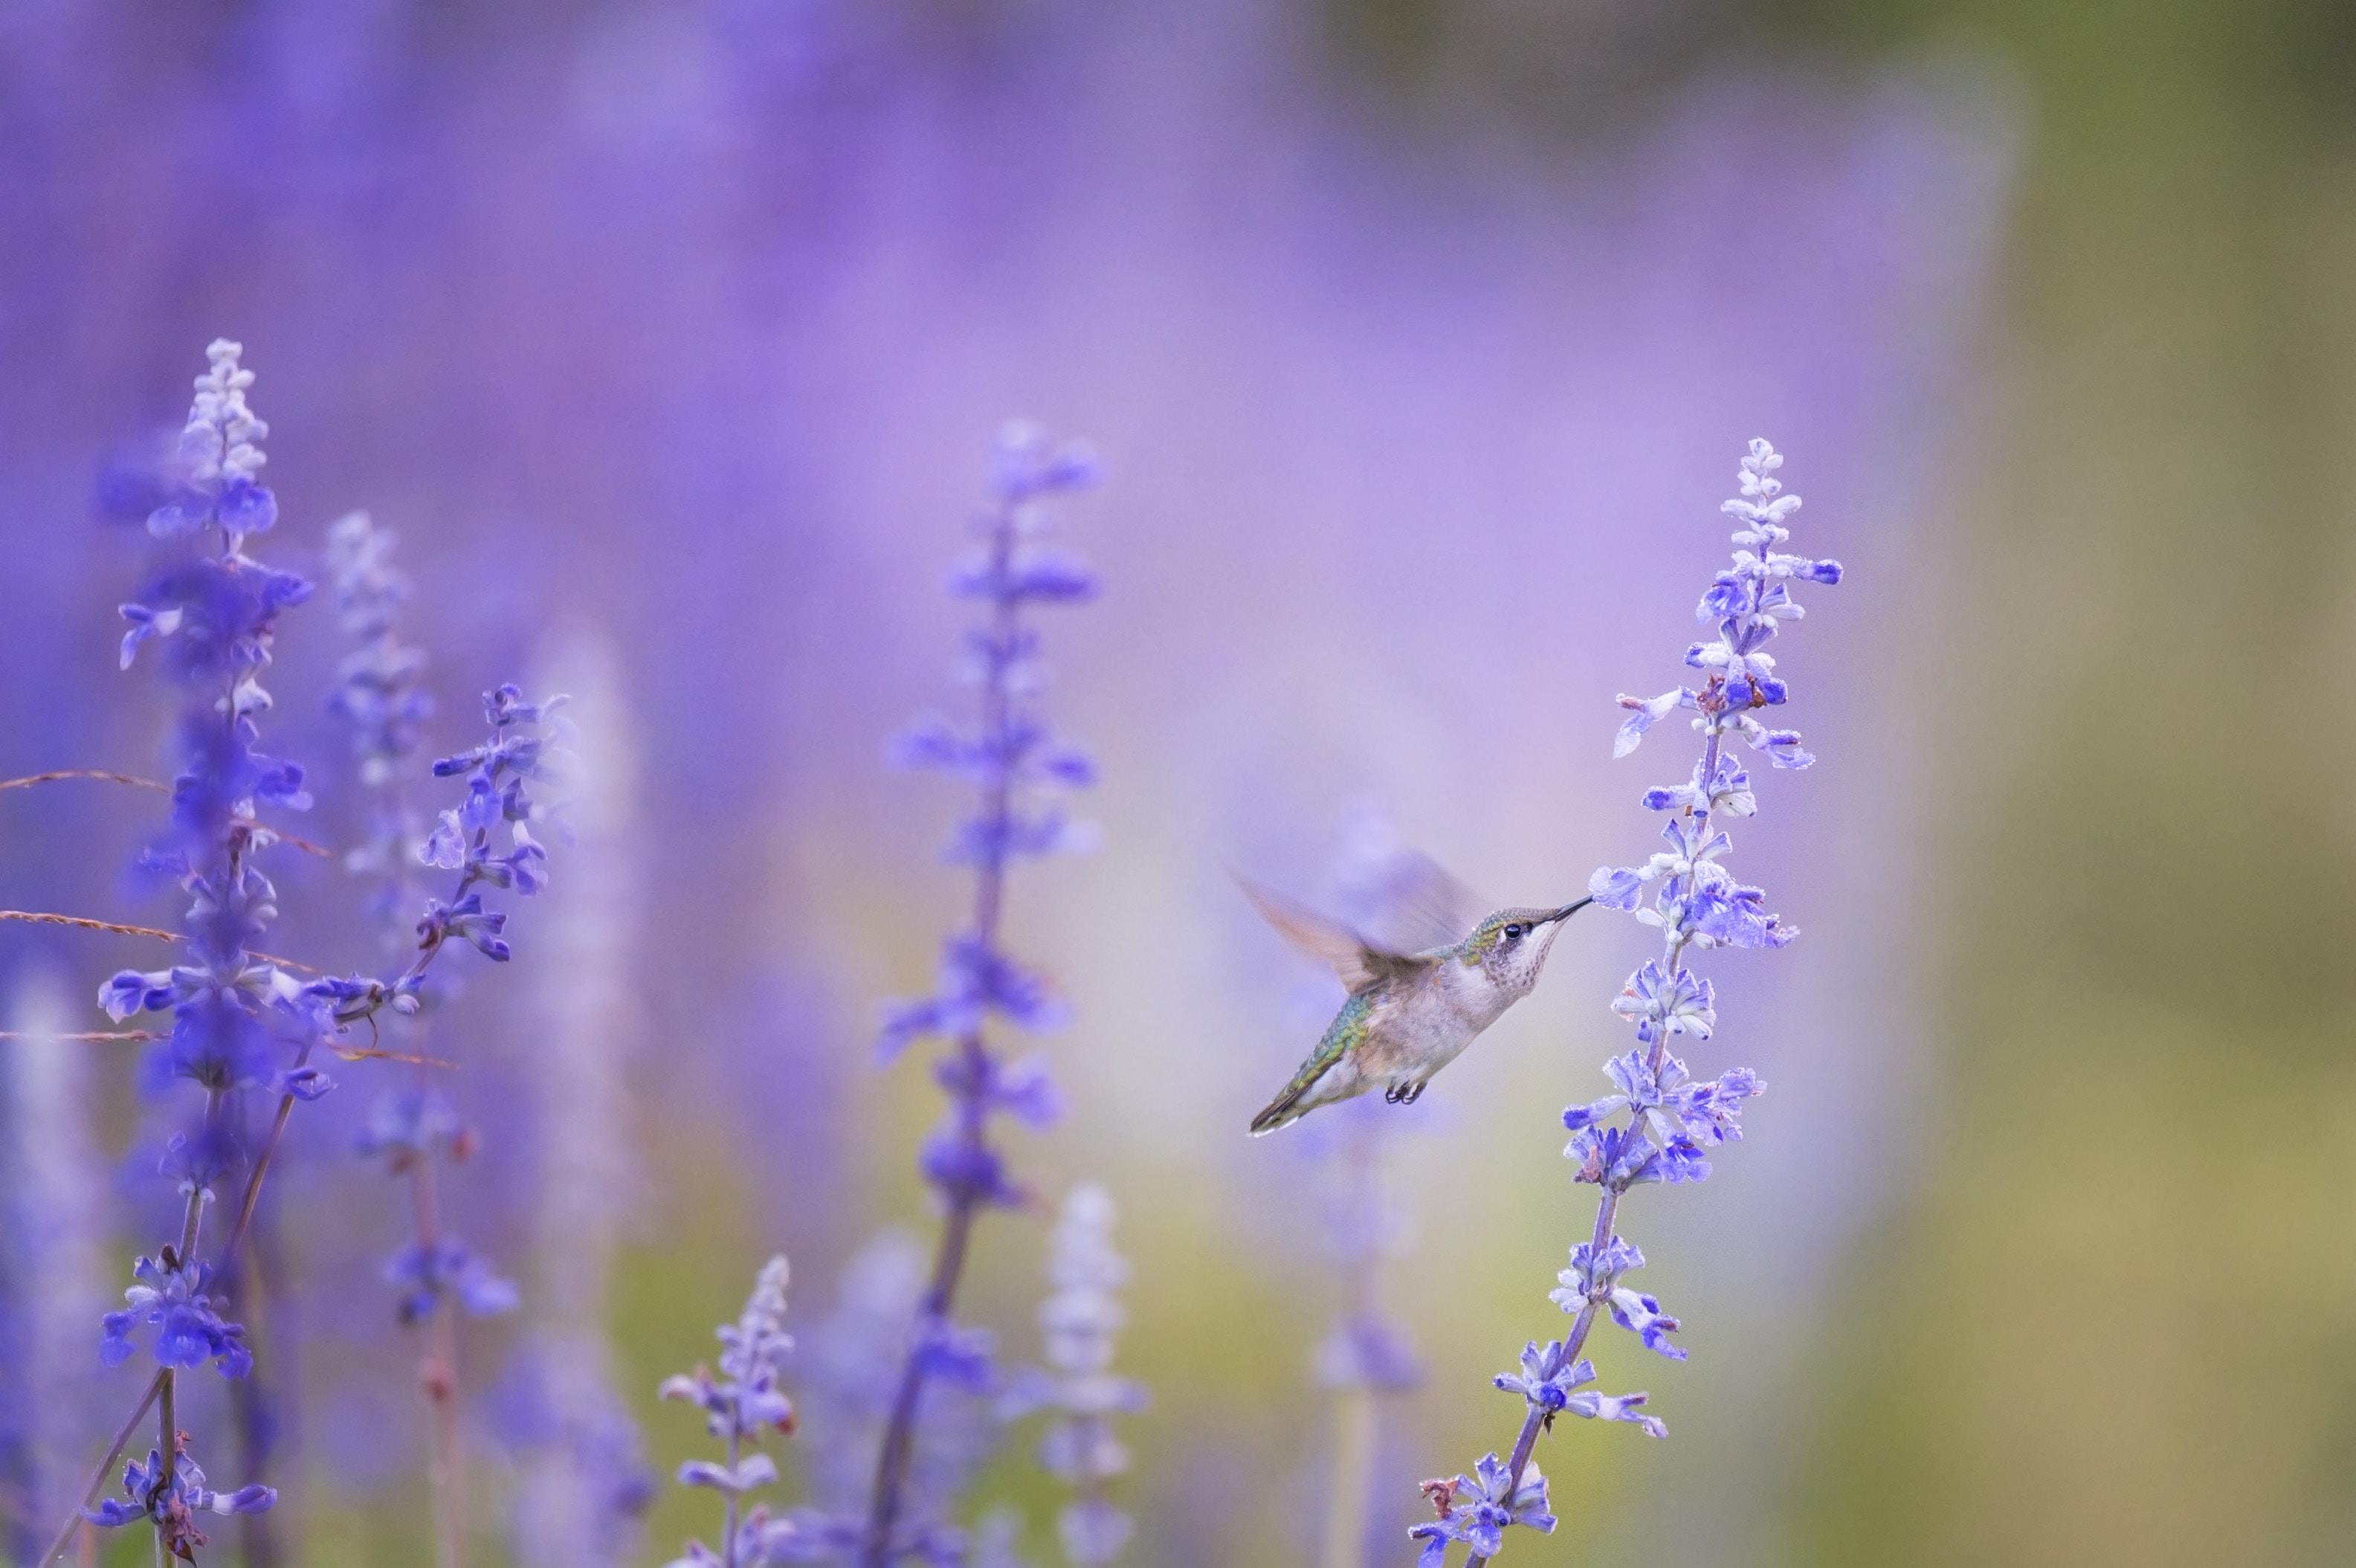 A hummingbird feeding on lavender flowers